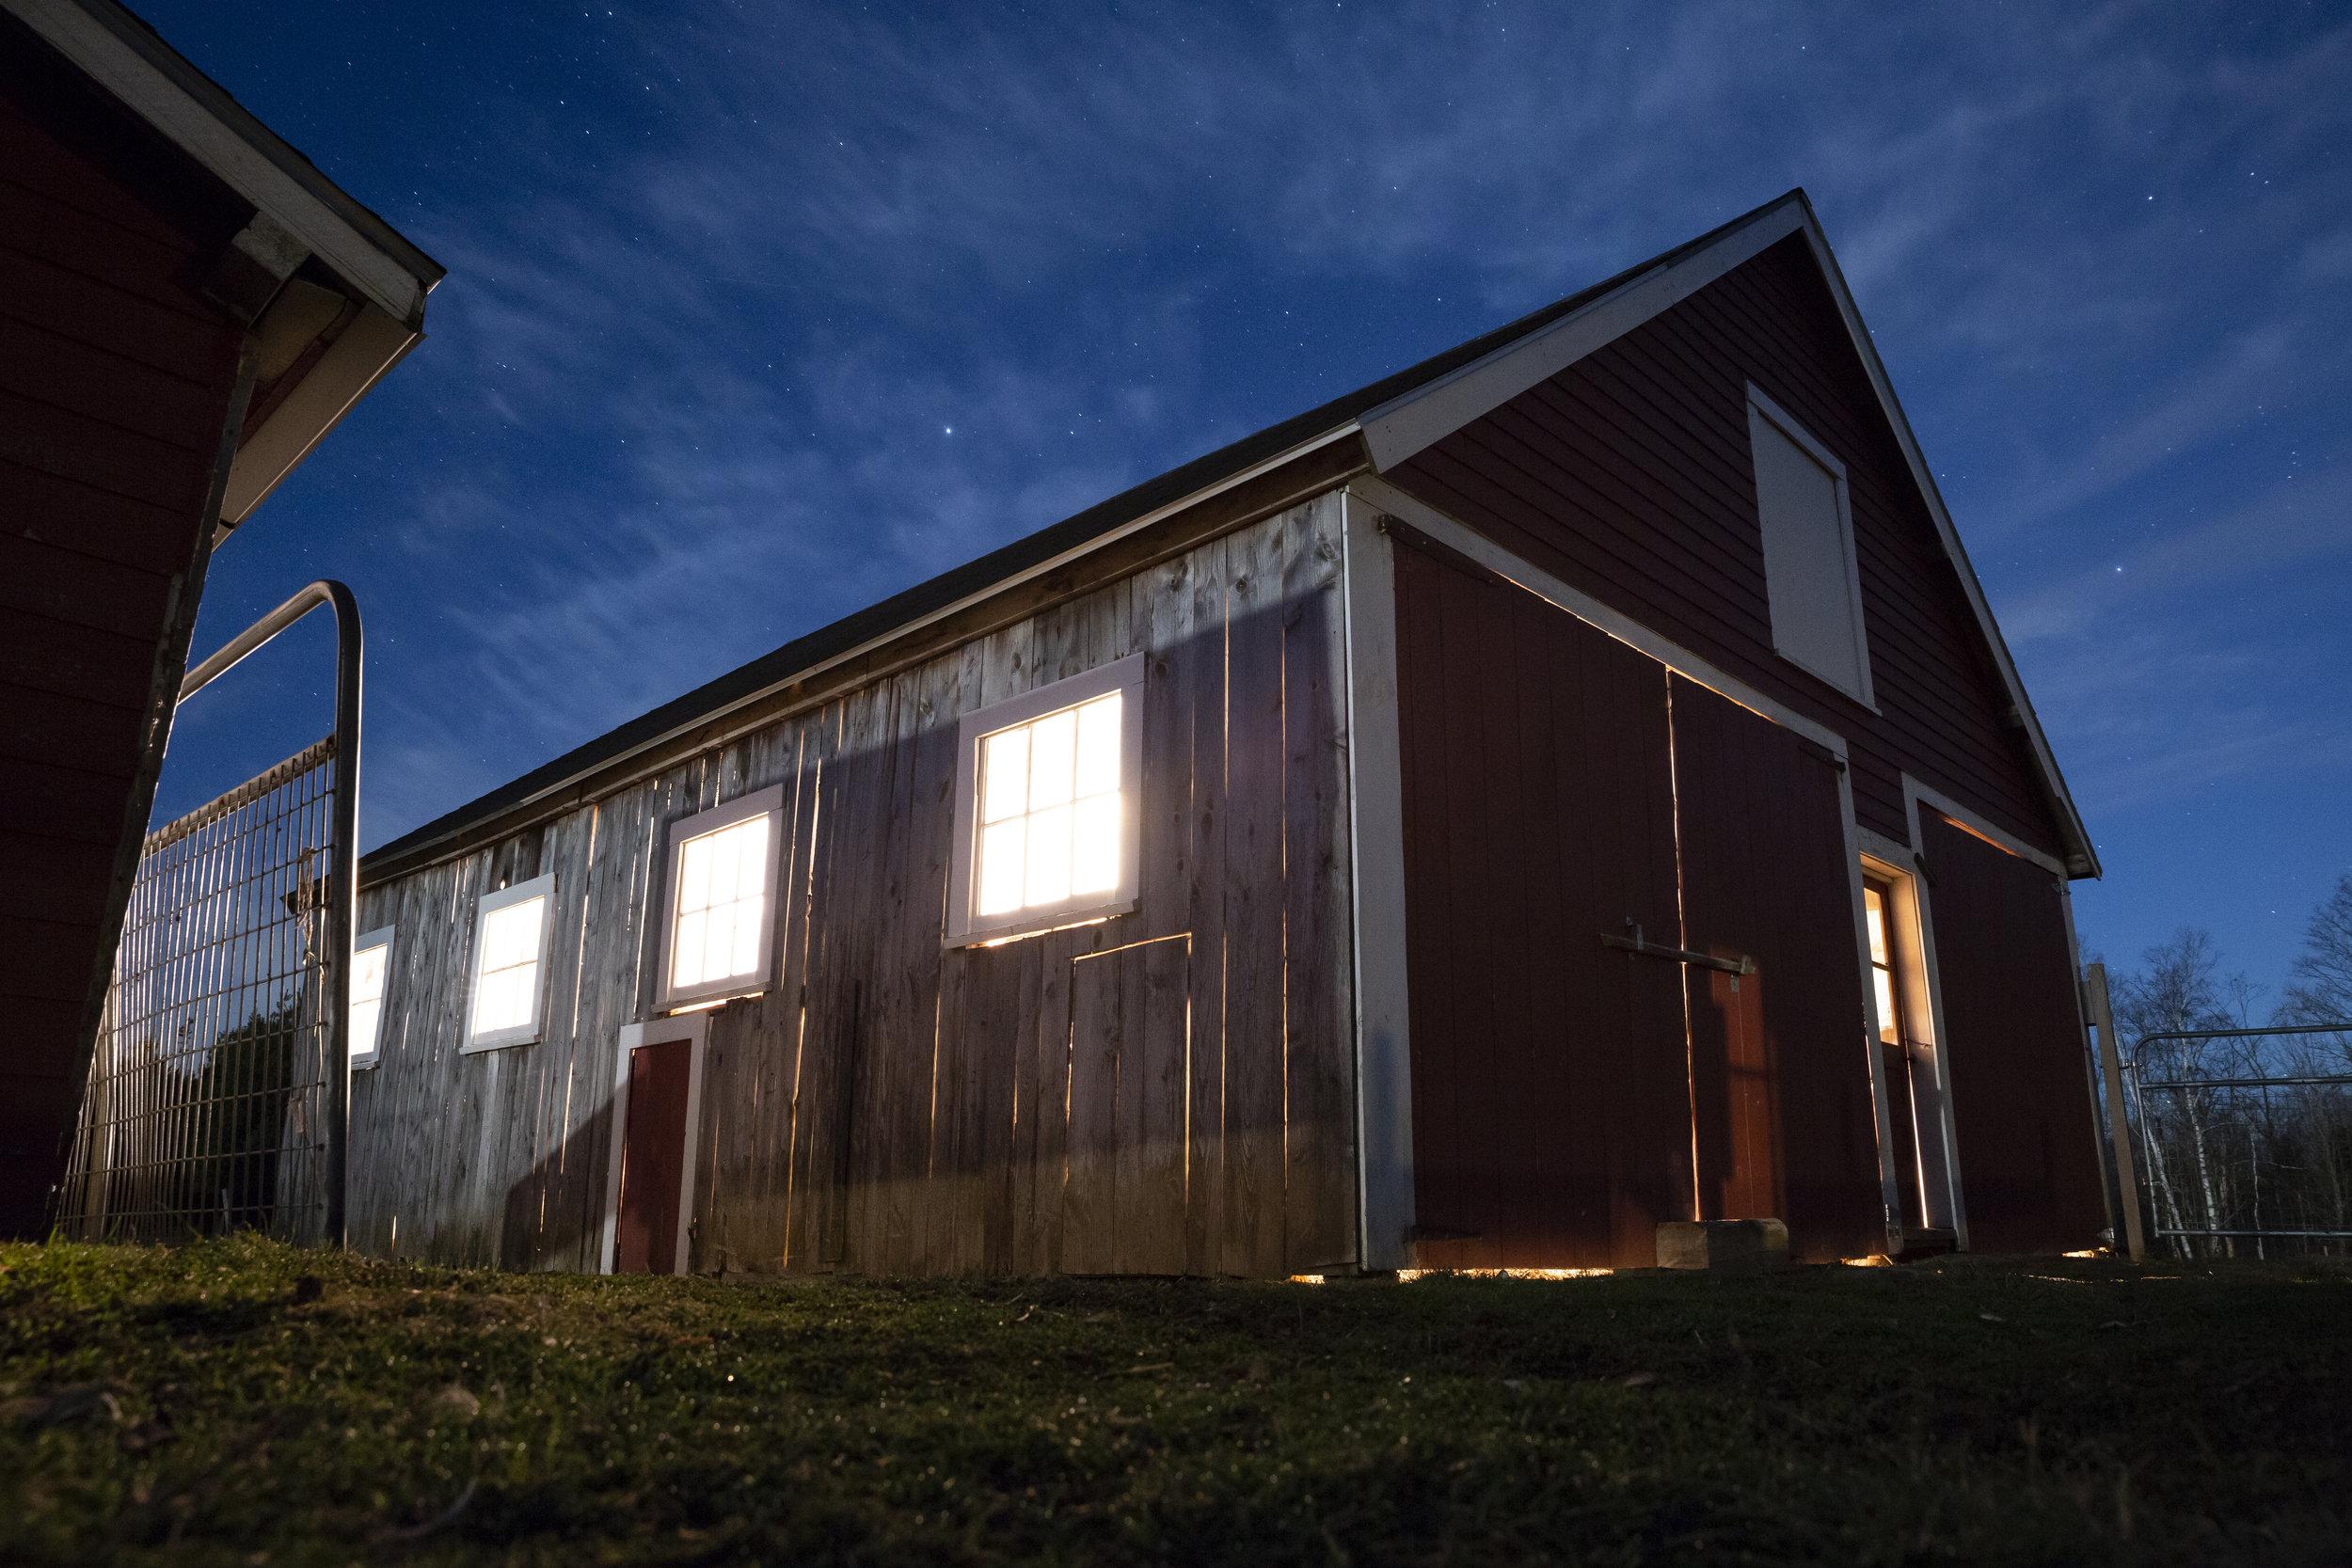 03-Barn-At-Night_4-30-18_RAW_Digital.jpg